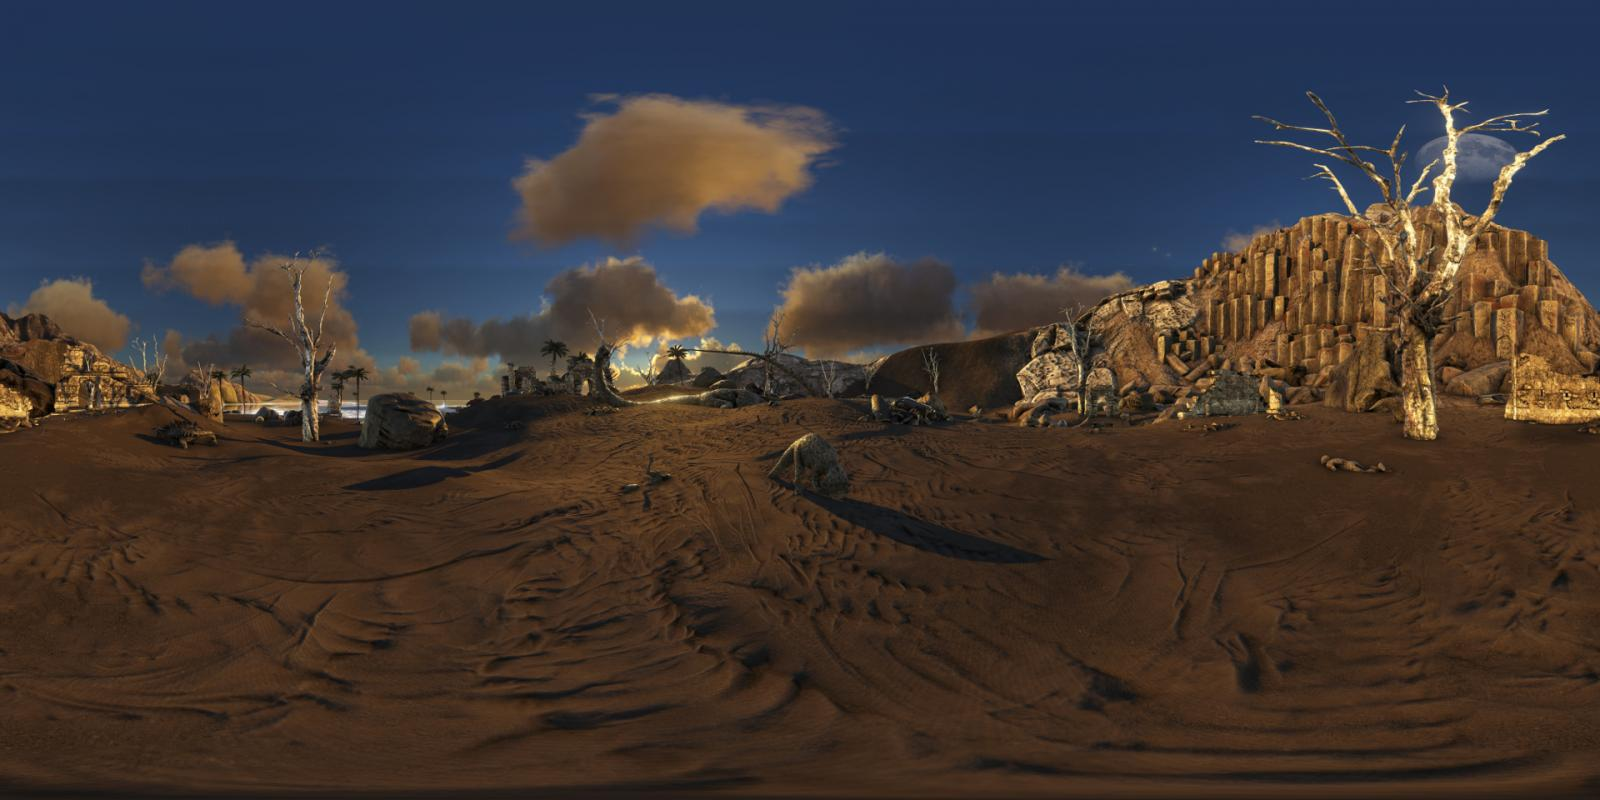 large.598487b7c3fe2_roguewolf91-EchoesoftheForgotten-Panoramic360Stereoscopic3D.jpg